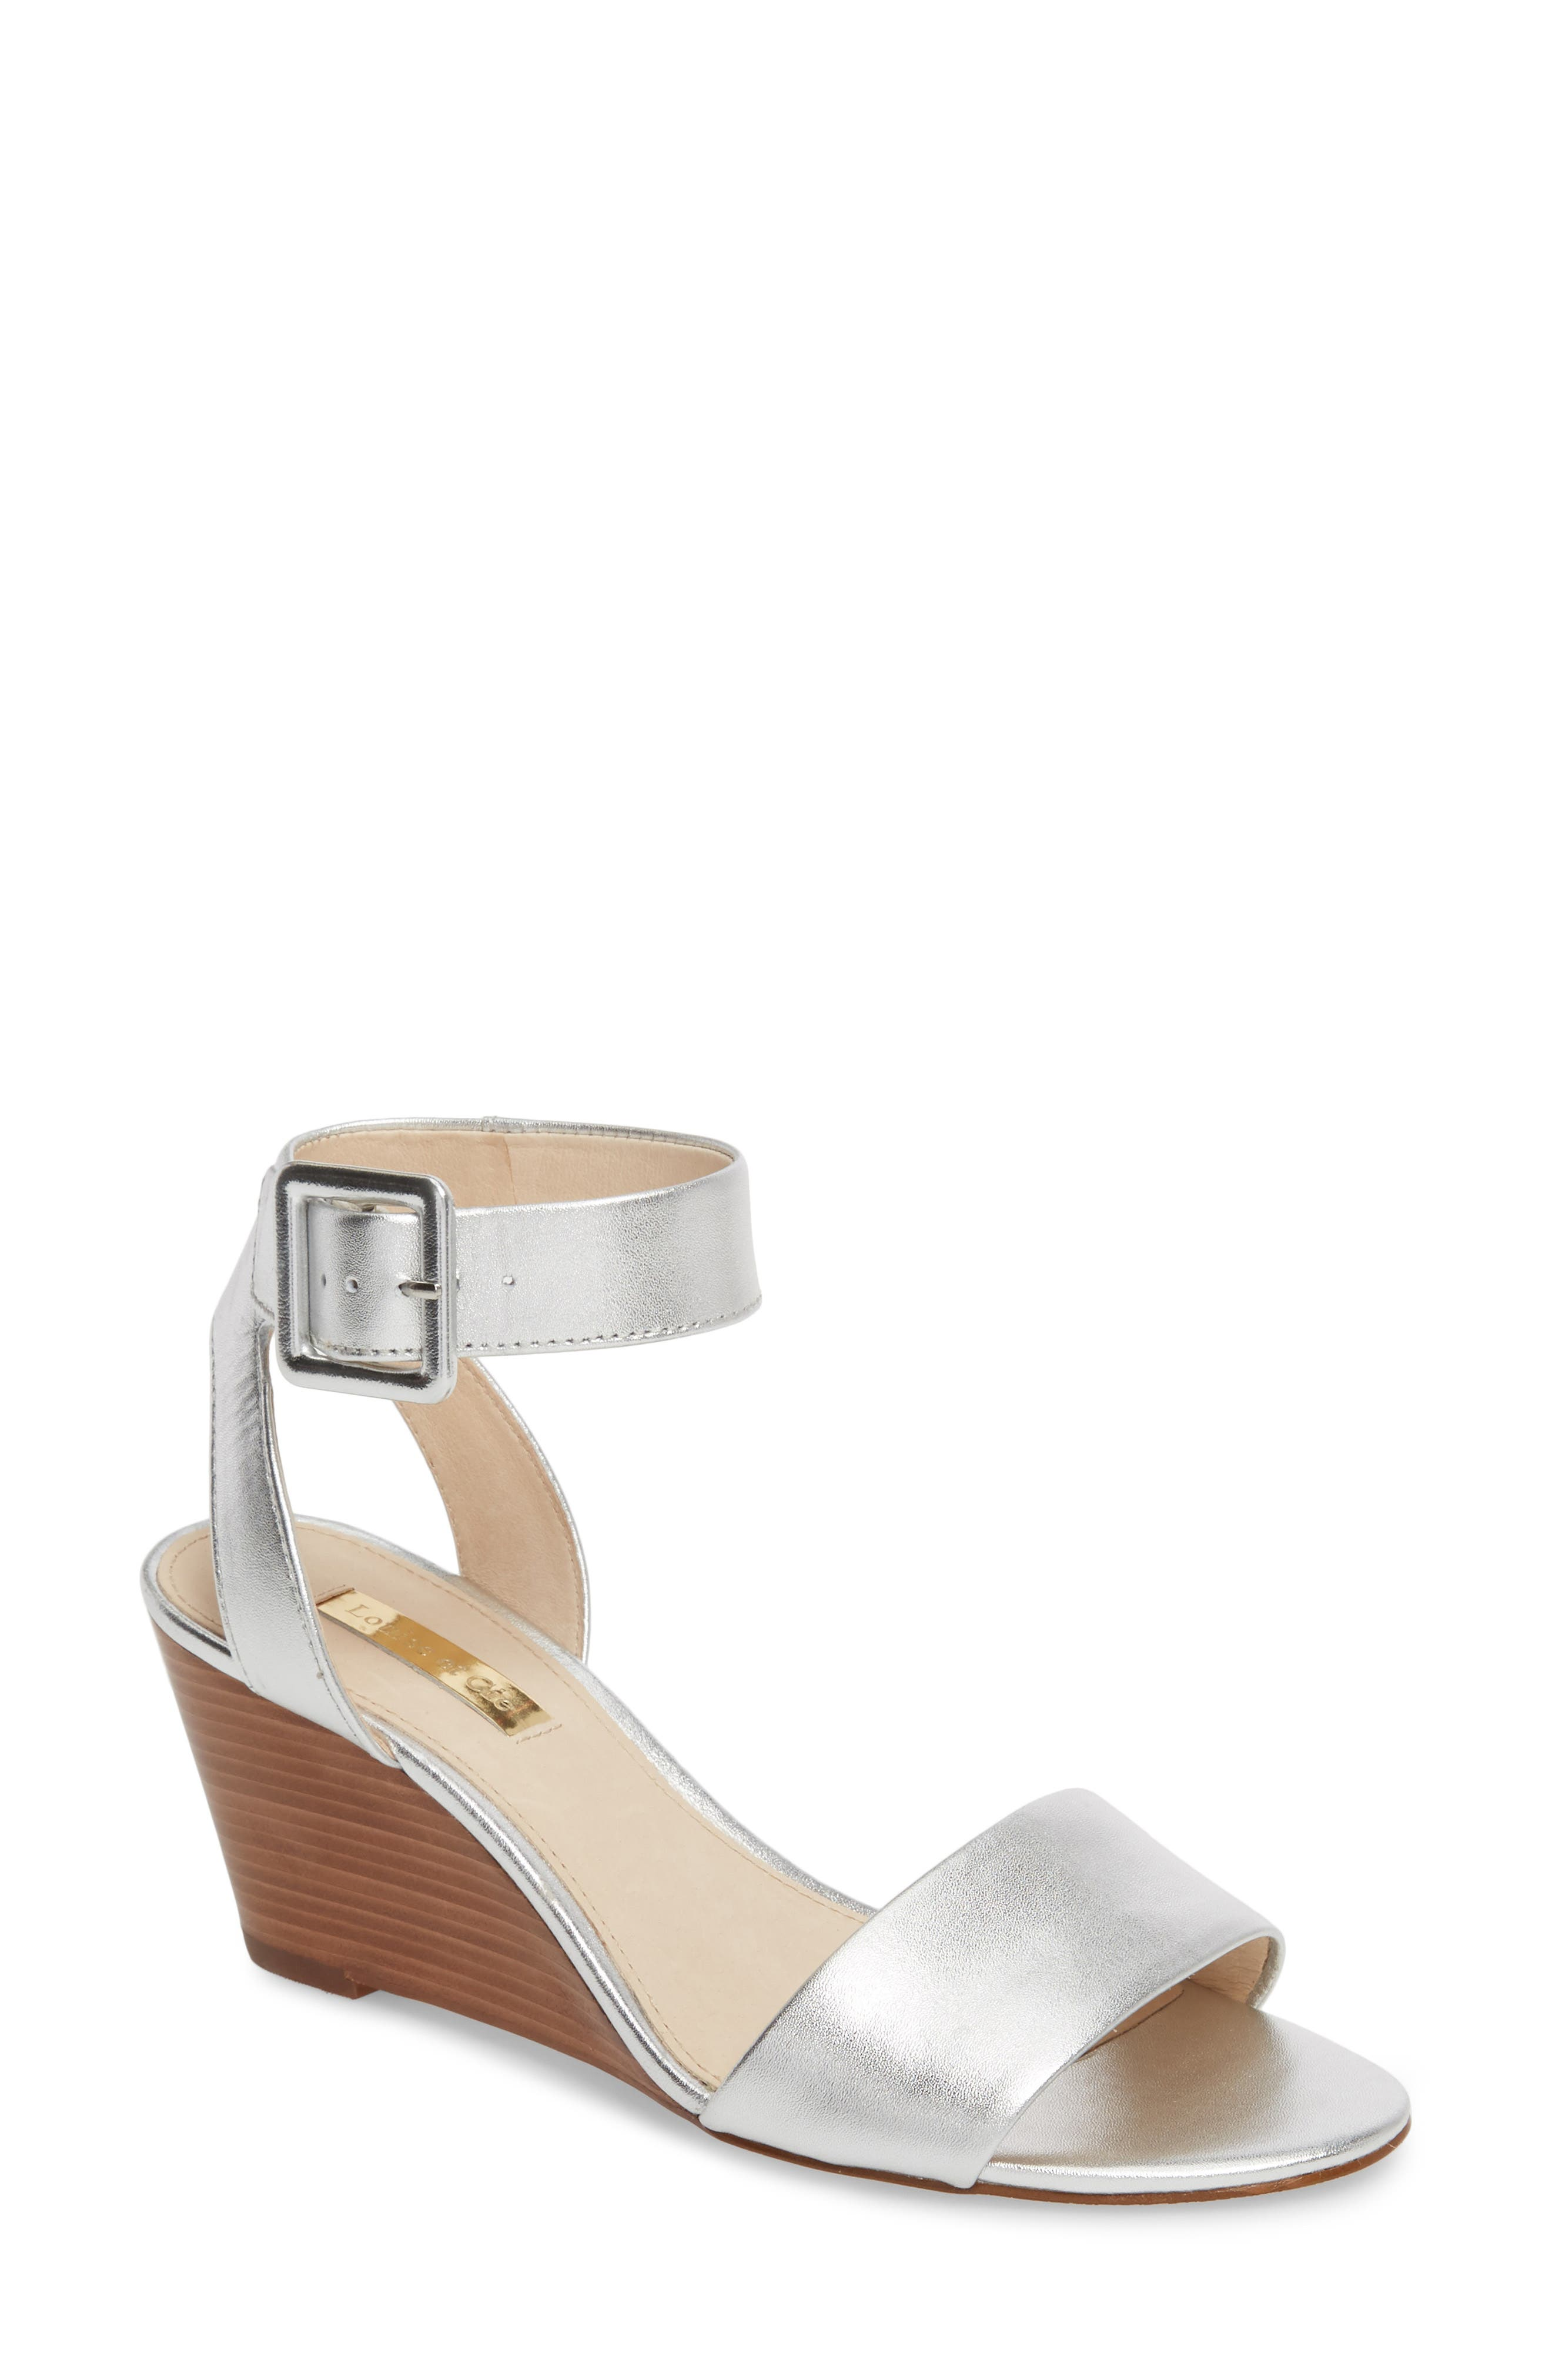 Punya Wedge Sandal,                         Main,                         color, Metallic Silver Leather